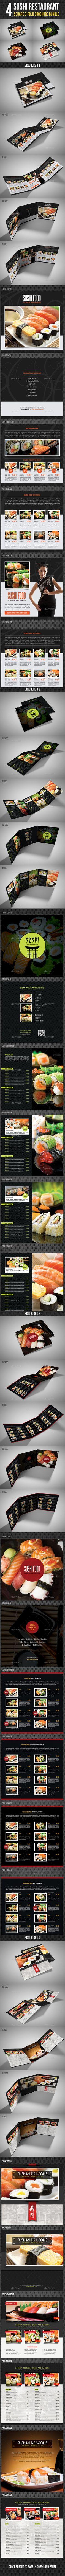 4 Sushi Restaurant Menu 3-Fold Brochure Bundle Template #design Download: http://graphicriver.net/item/4-sushi-restaurant-menu-3fold-brochure-bundle/12047887?ref=ksioks